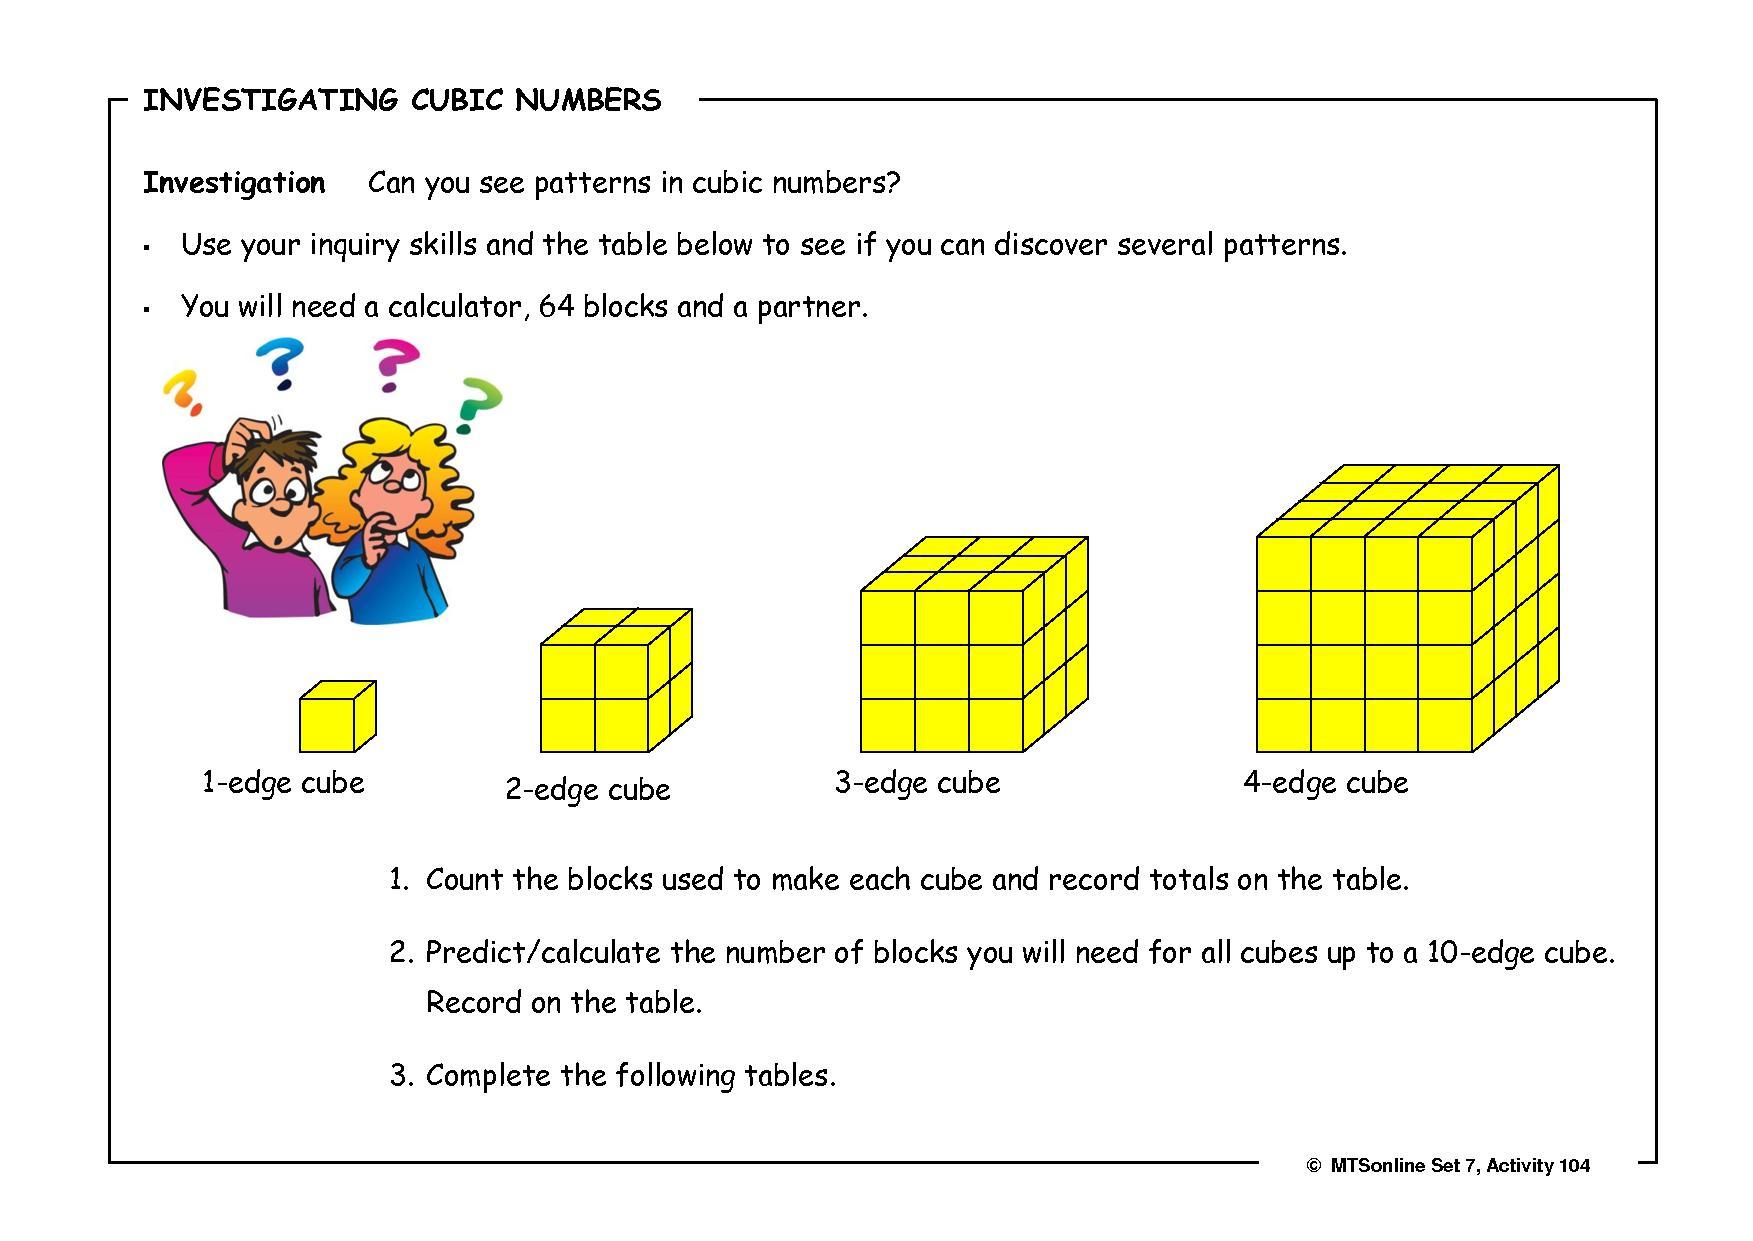 104investigating_cubic_numbers0001